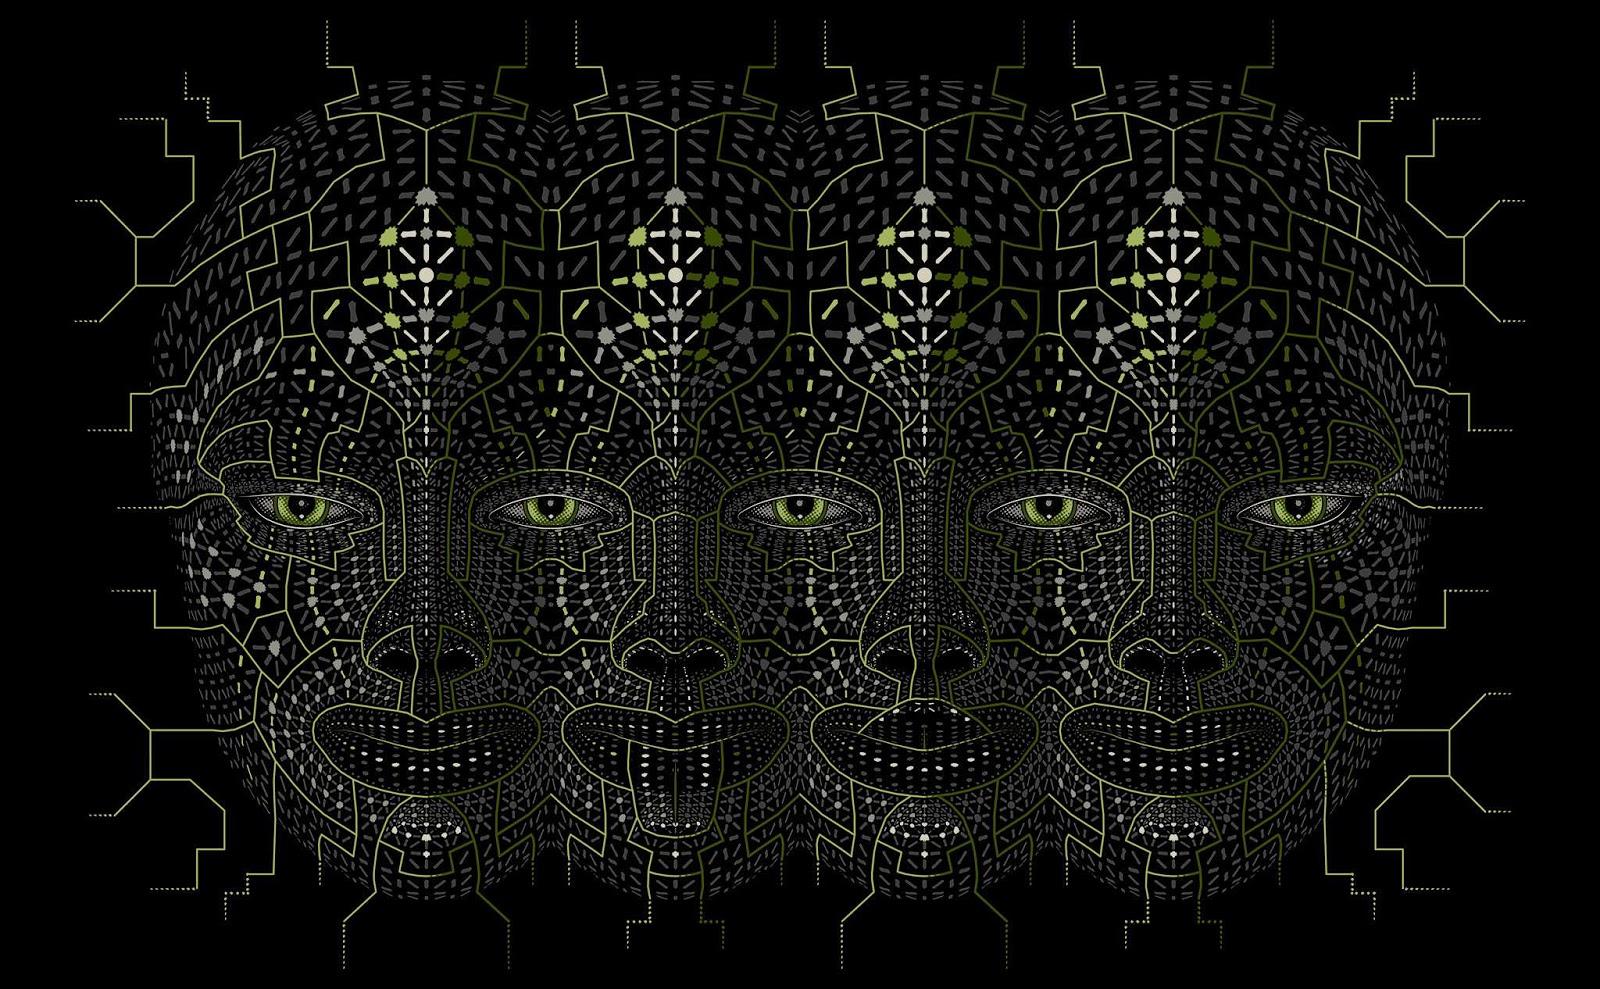 The Visionary Art of Symbolika